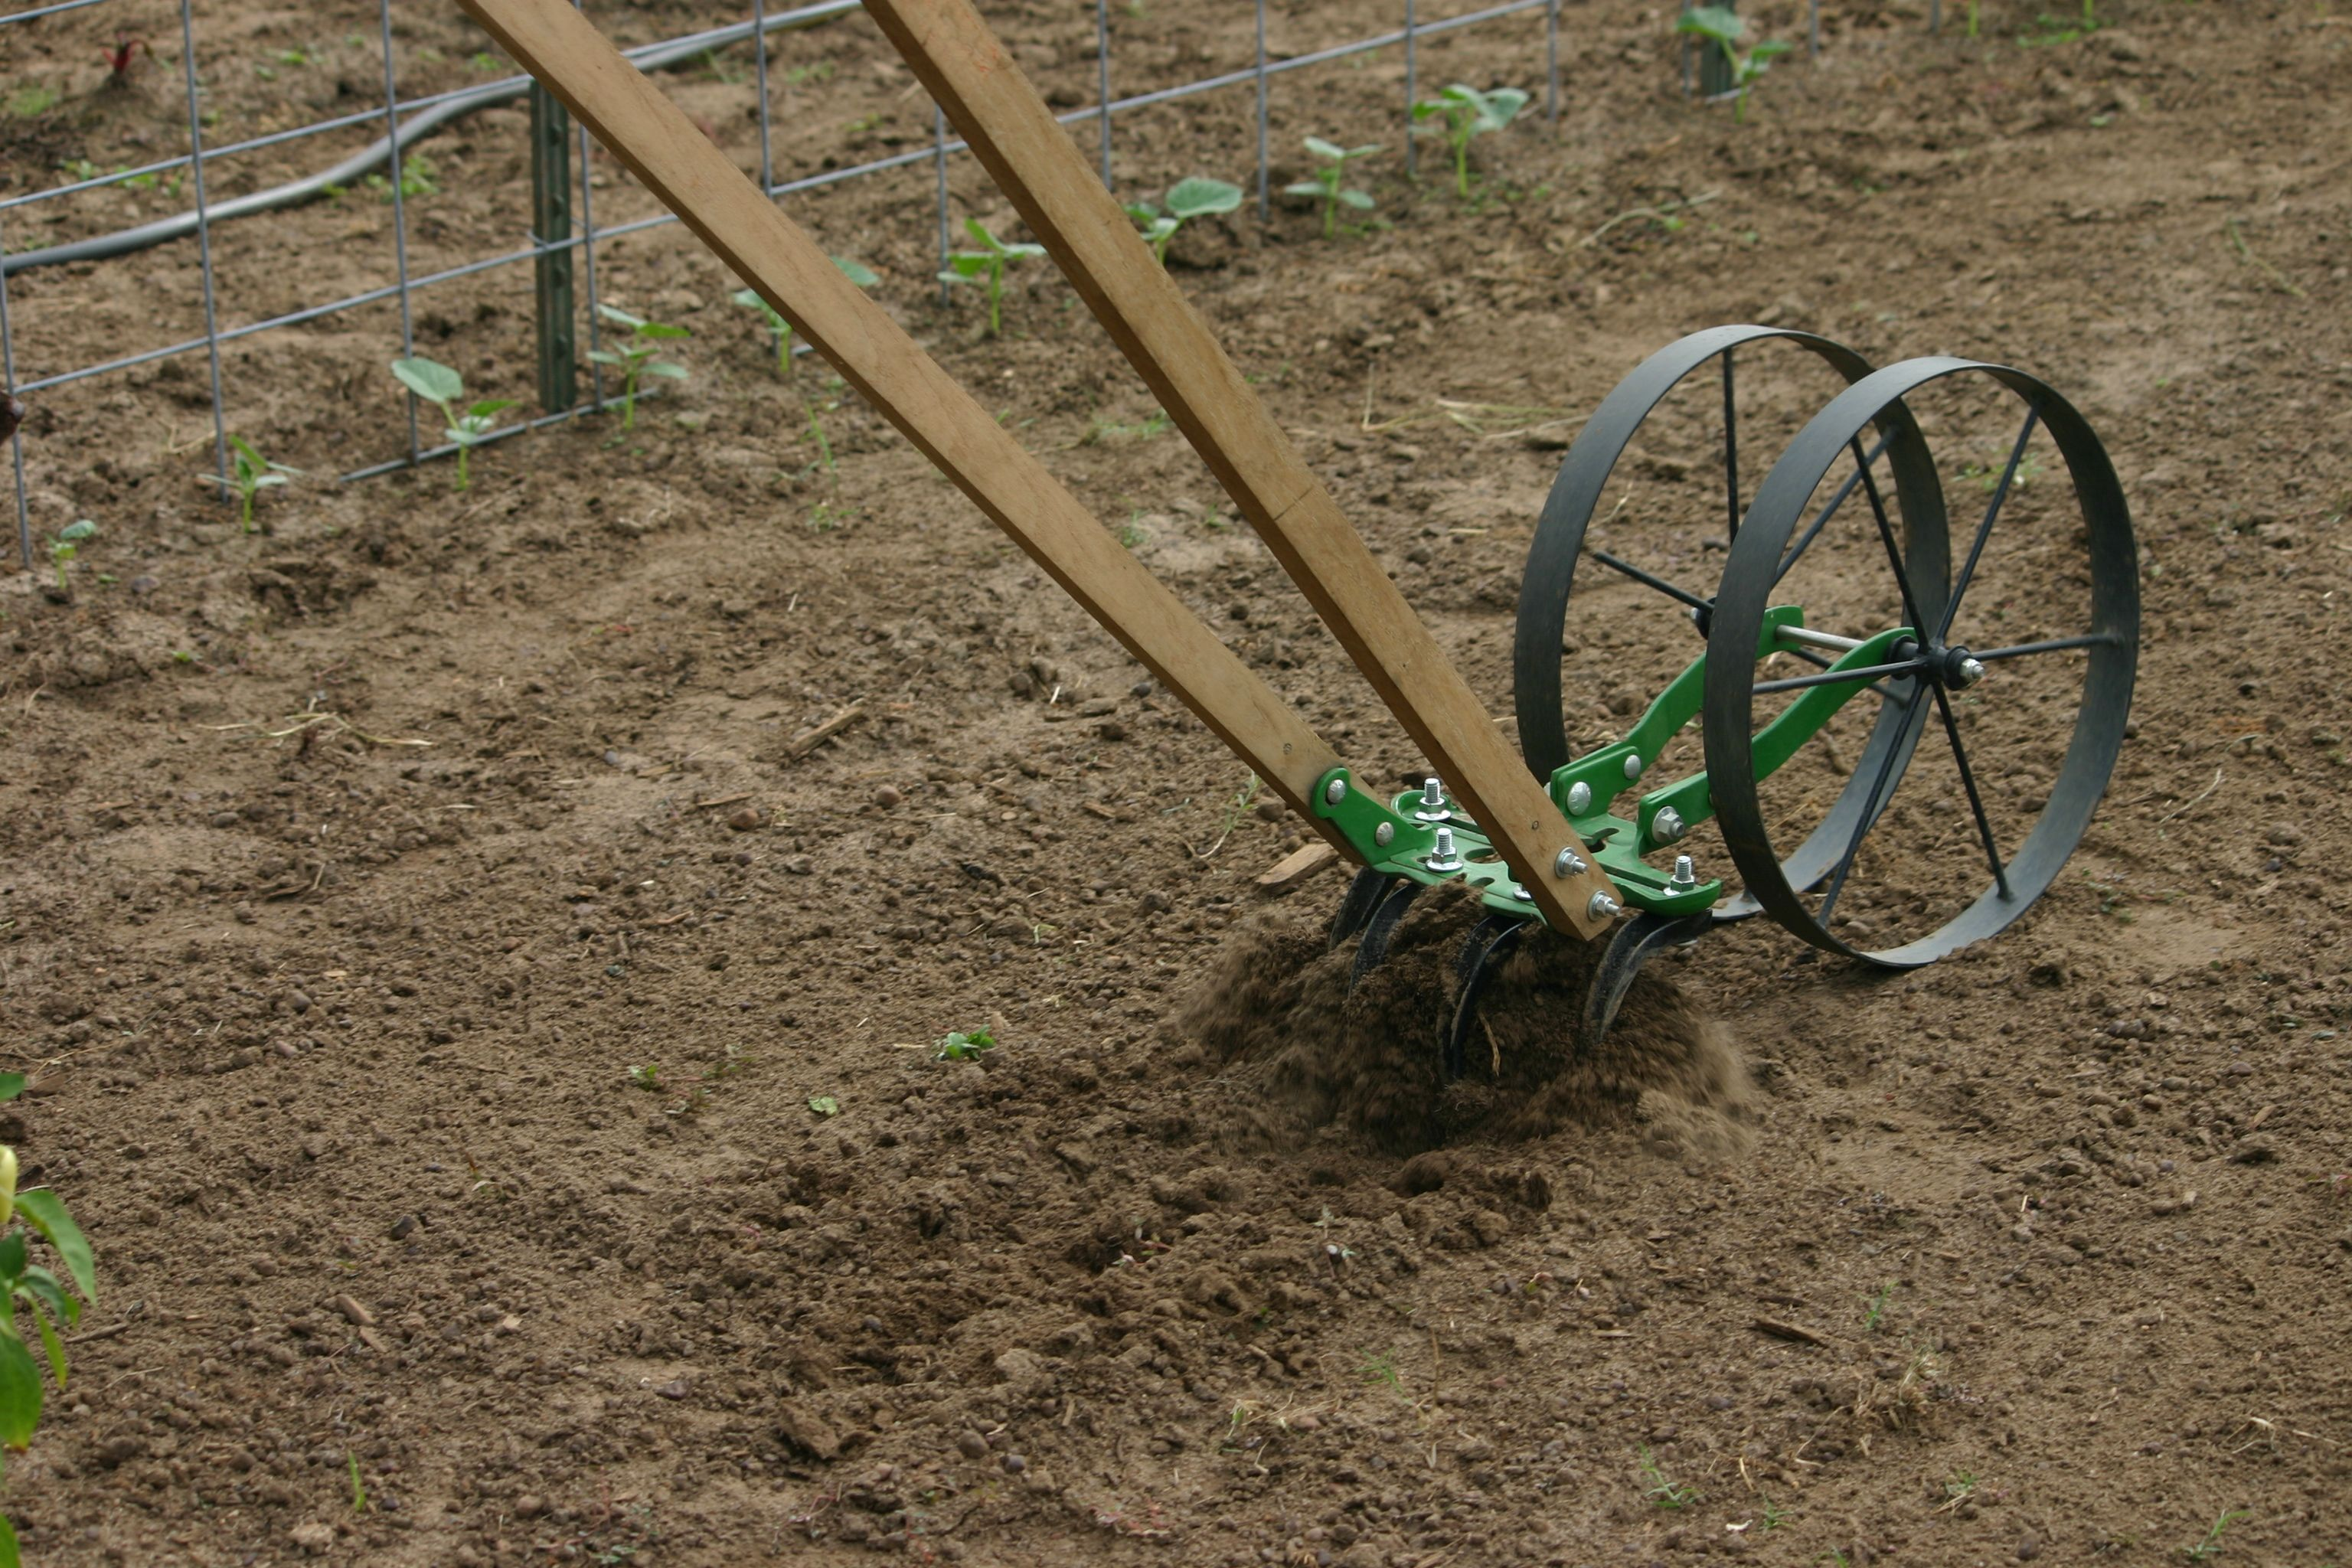 Double Wheel Hoe Hoss Tools Save Time Energy In The Garden Fall Crop Garden Garden Tools